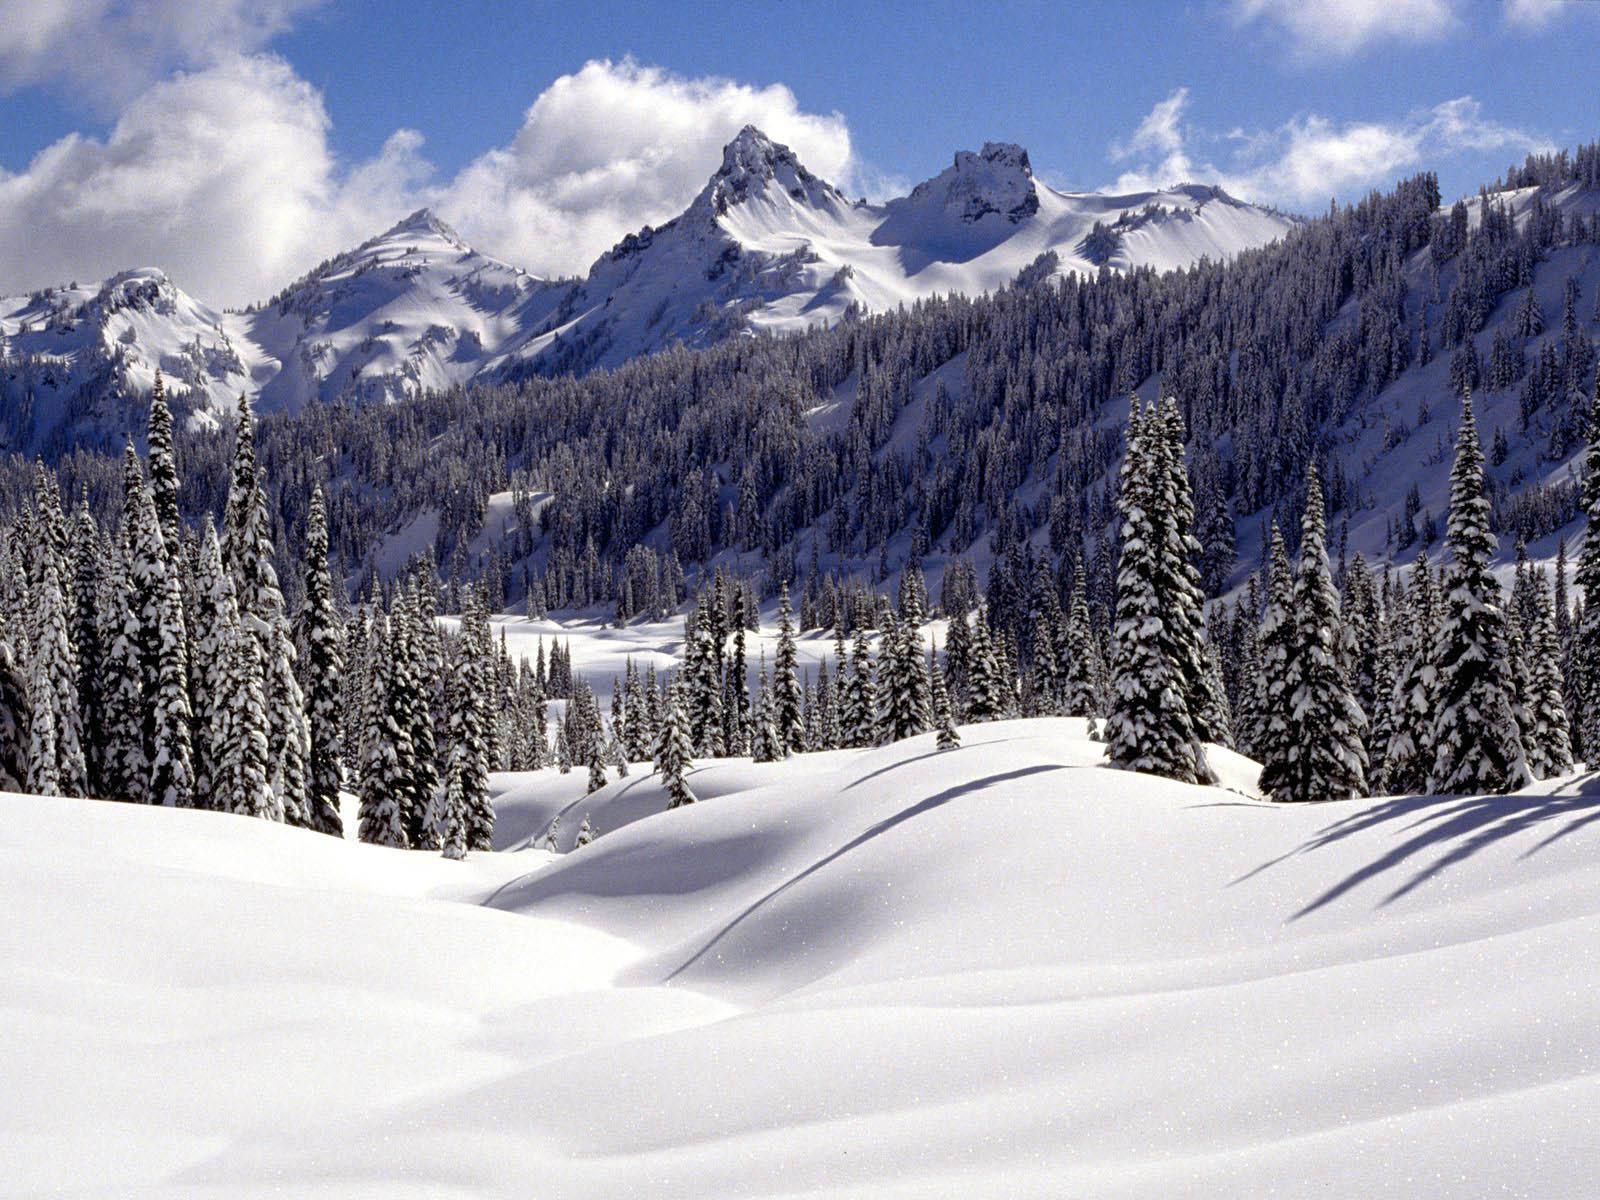 Displaying 9 gt images for snow desktop wallpaper